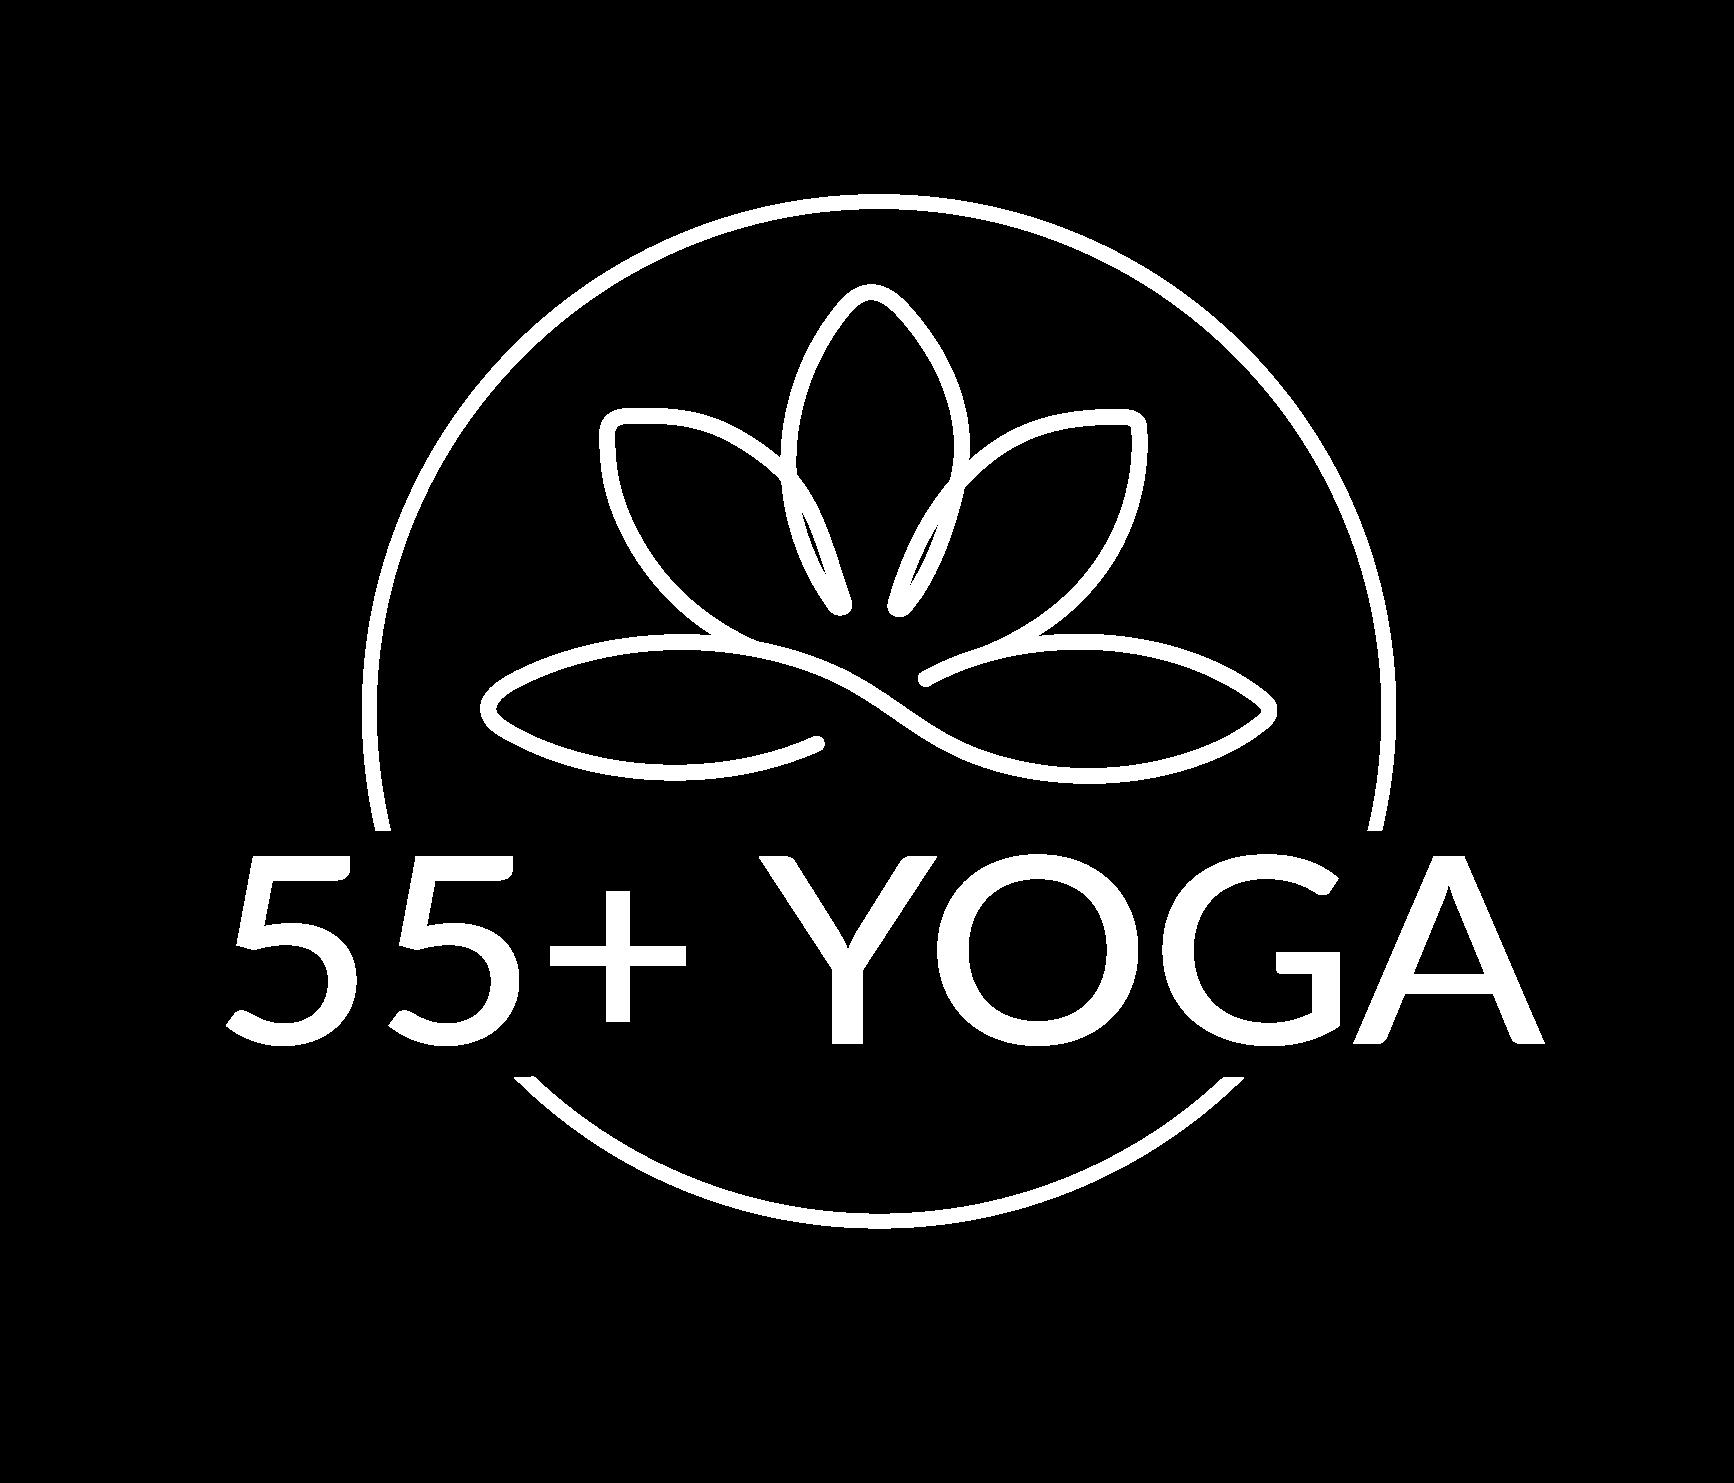 55+ YOGA